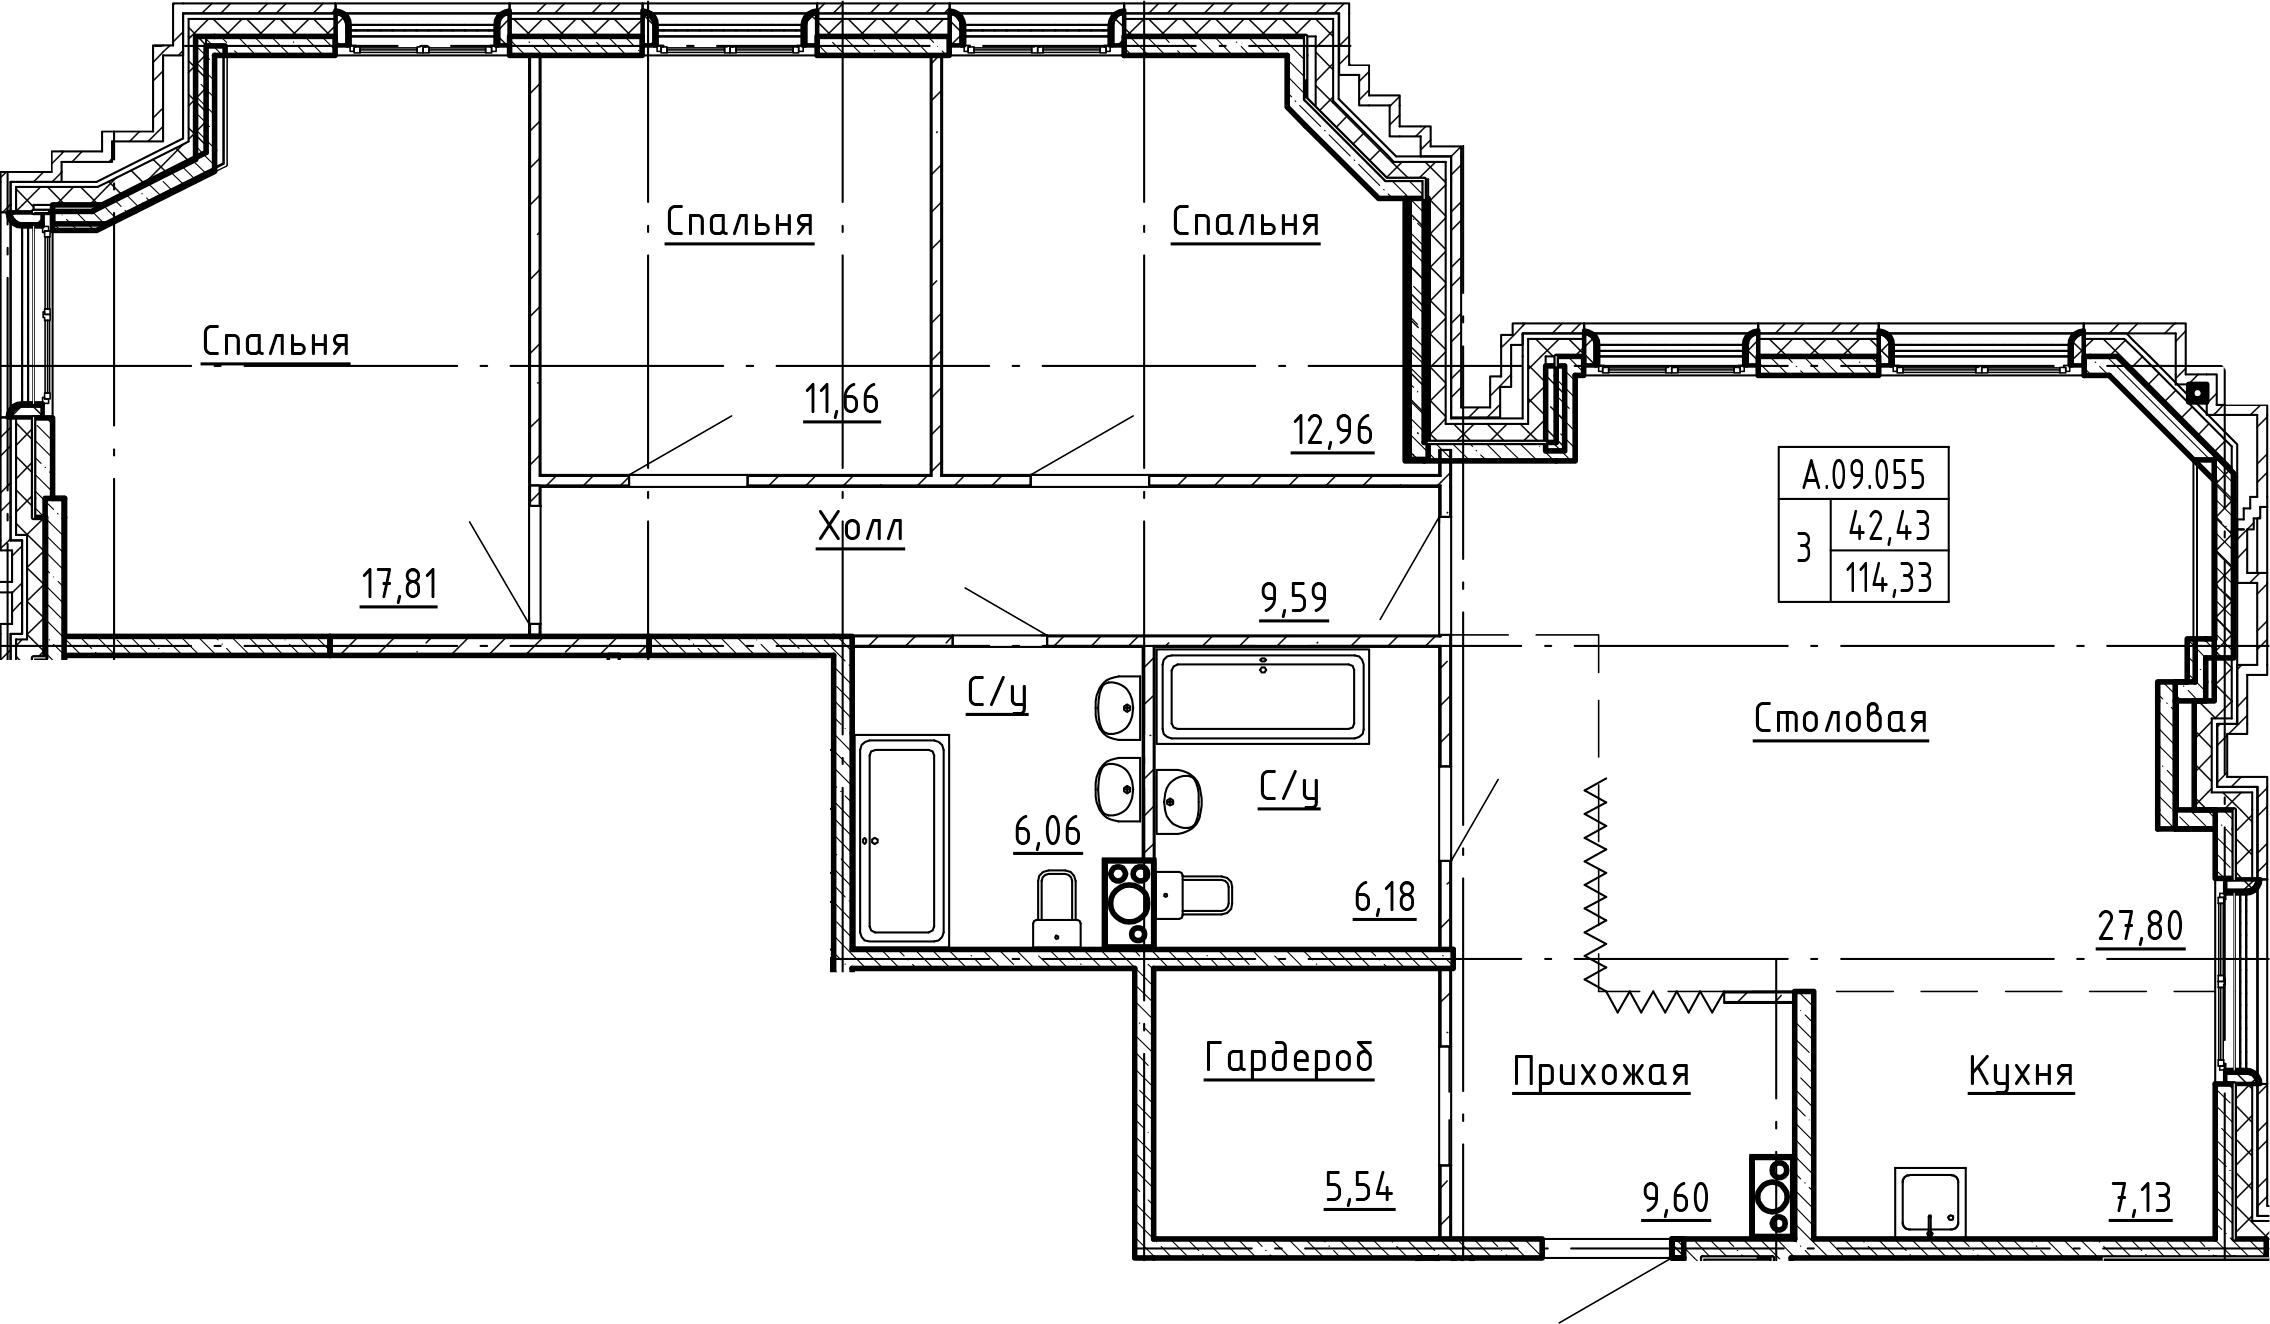 4Е-к.кв, 114.33 м²